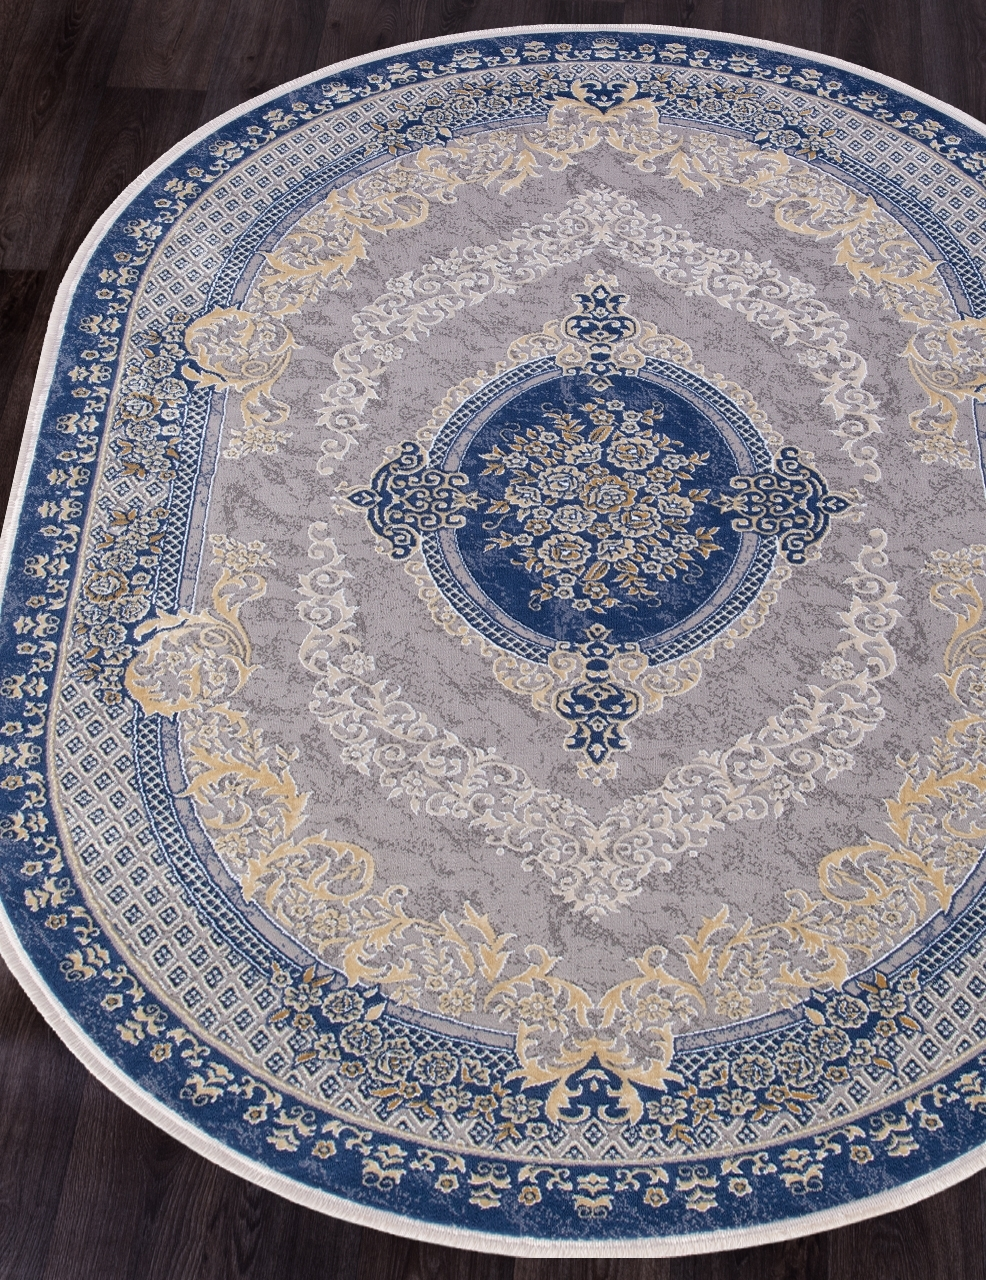 Ковер 33342 - 035 NAVY - Овал - коллекция QATAR